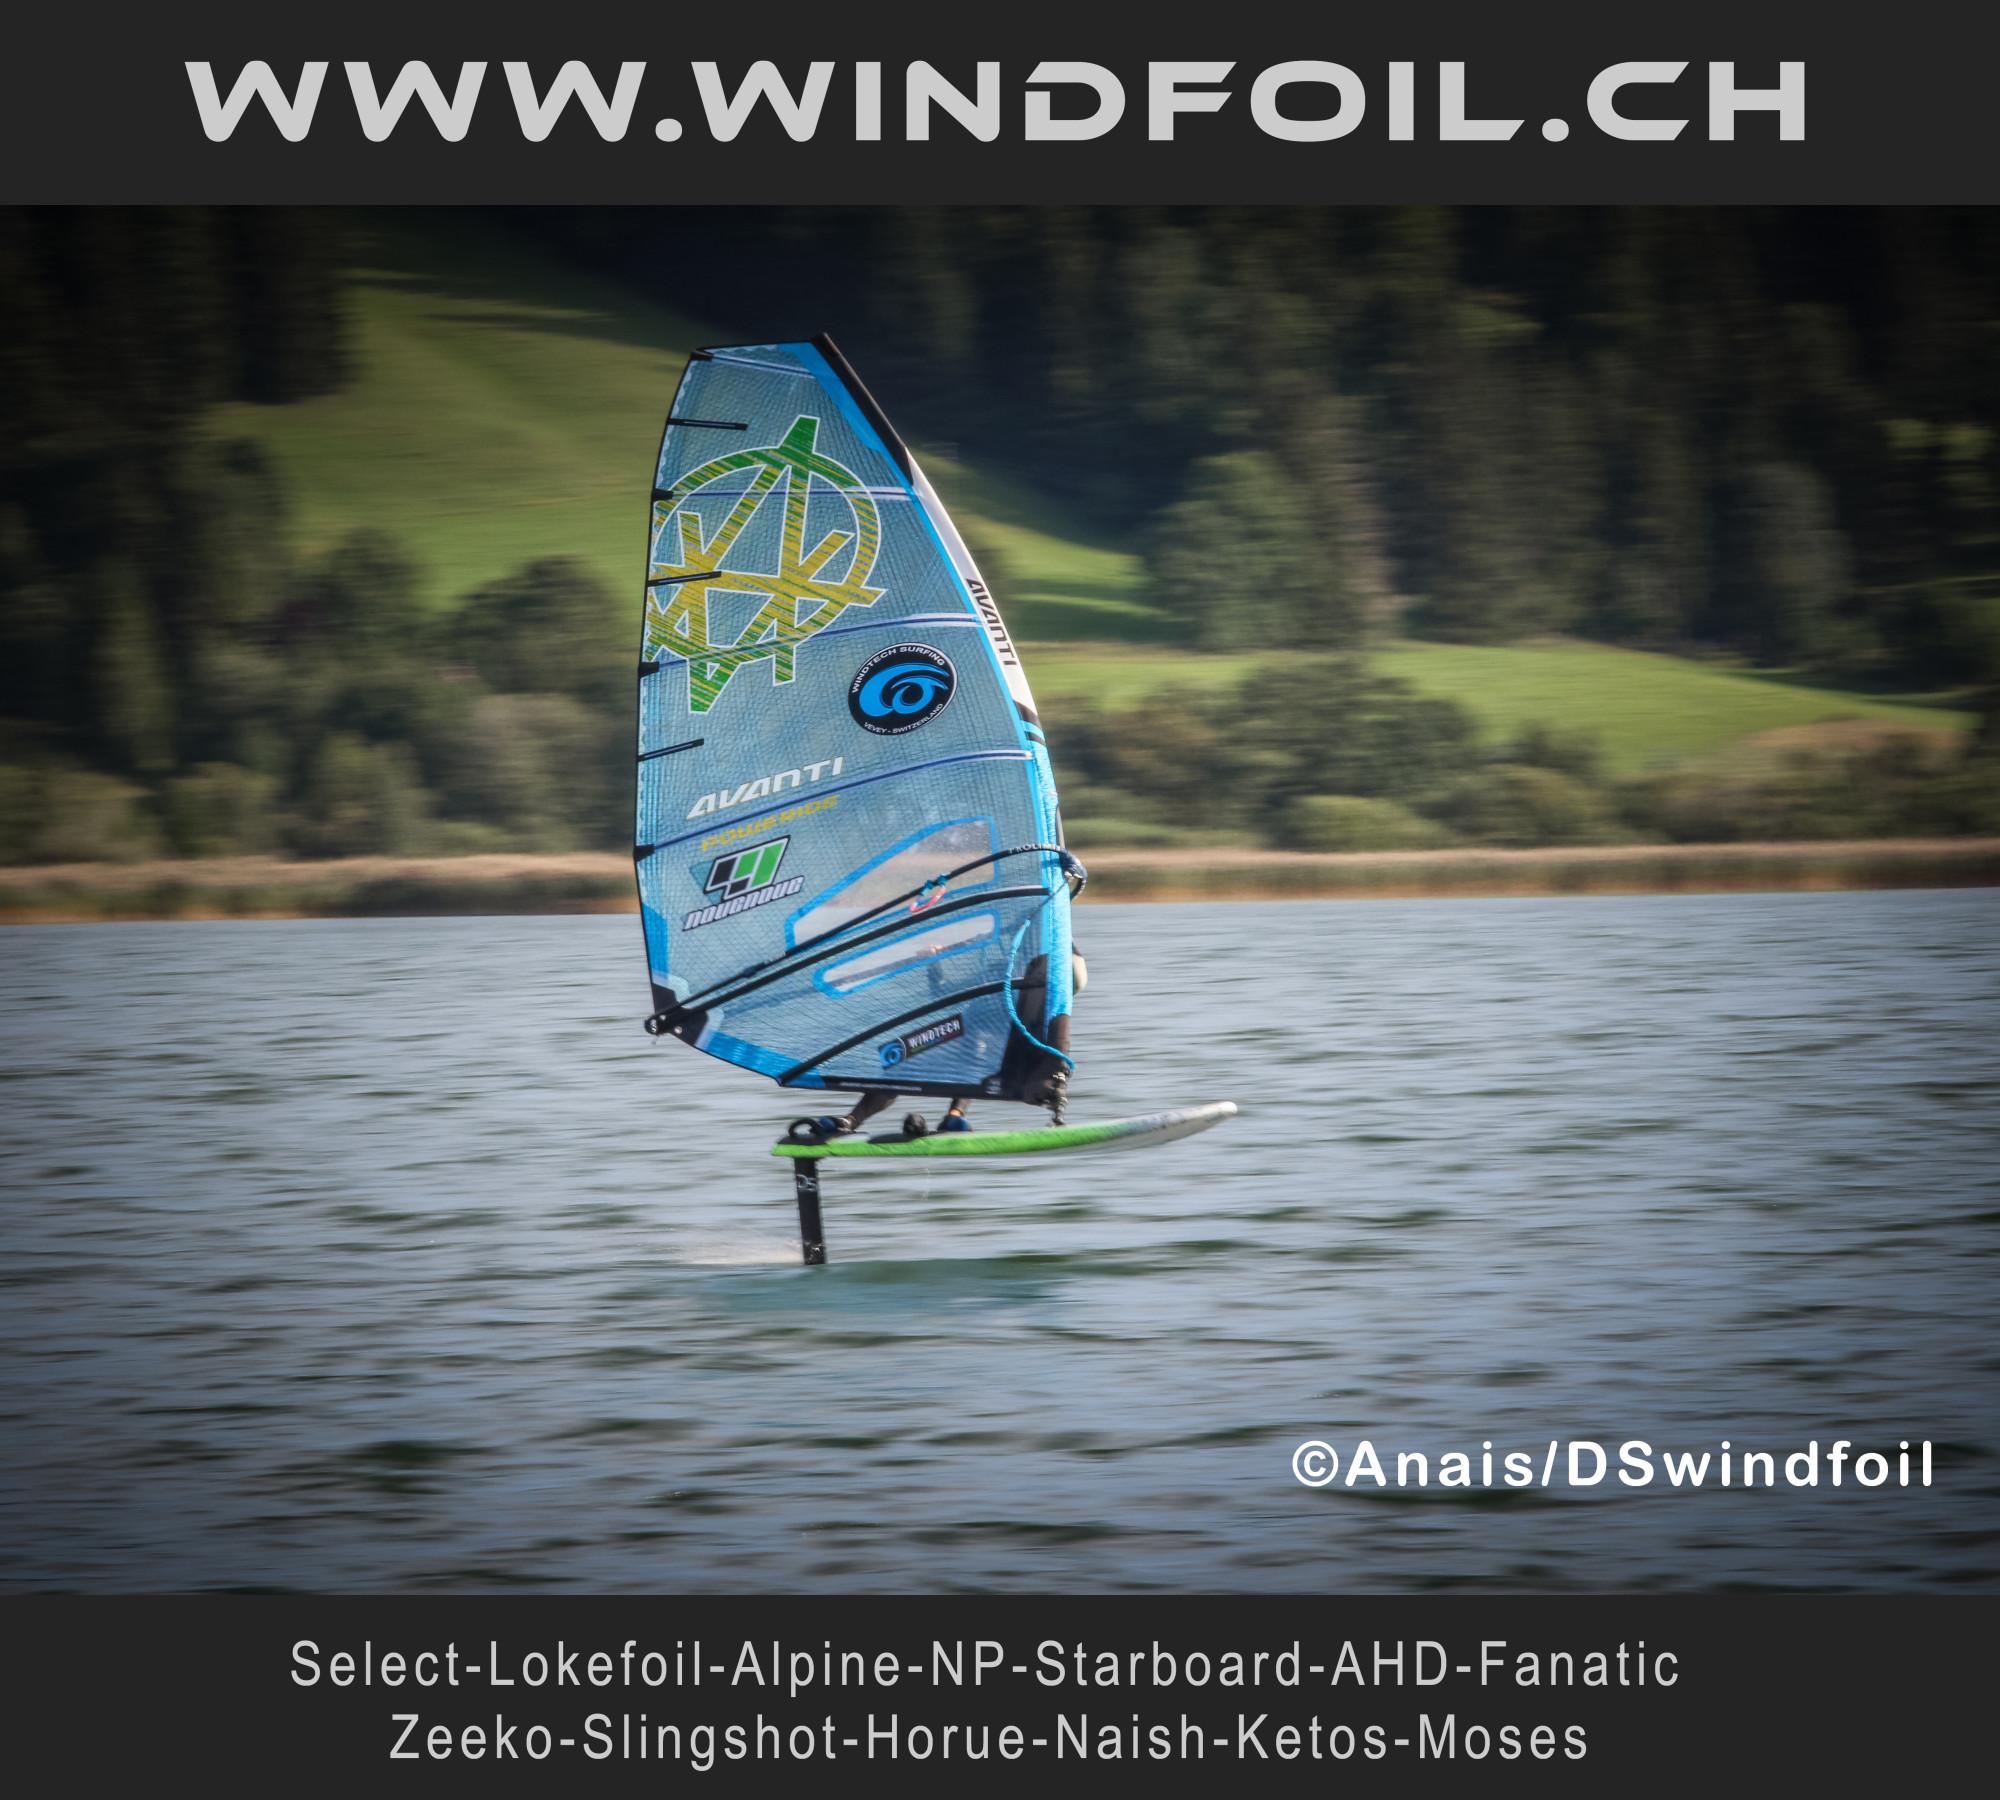 windfoil.ch